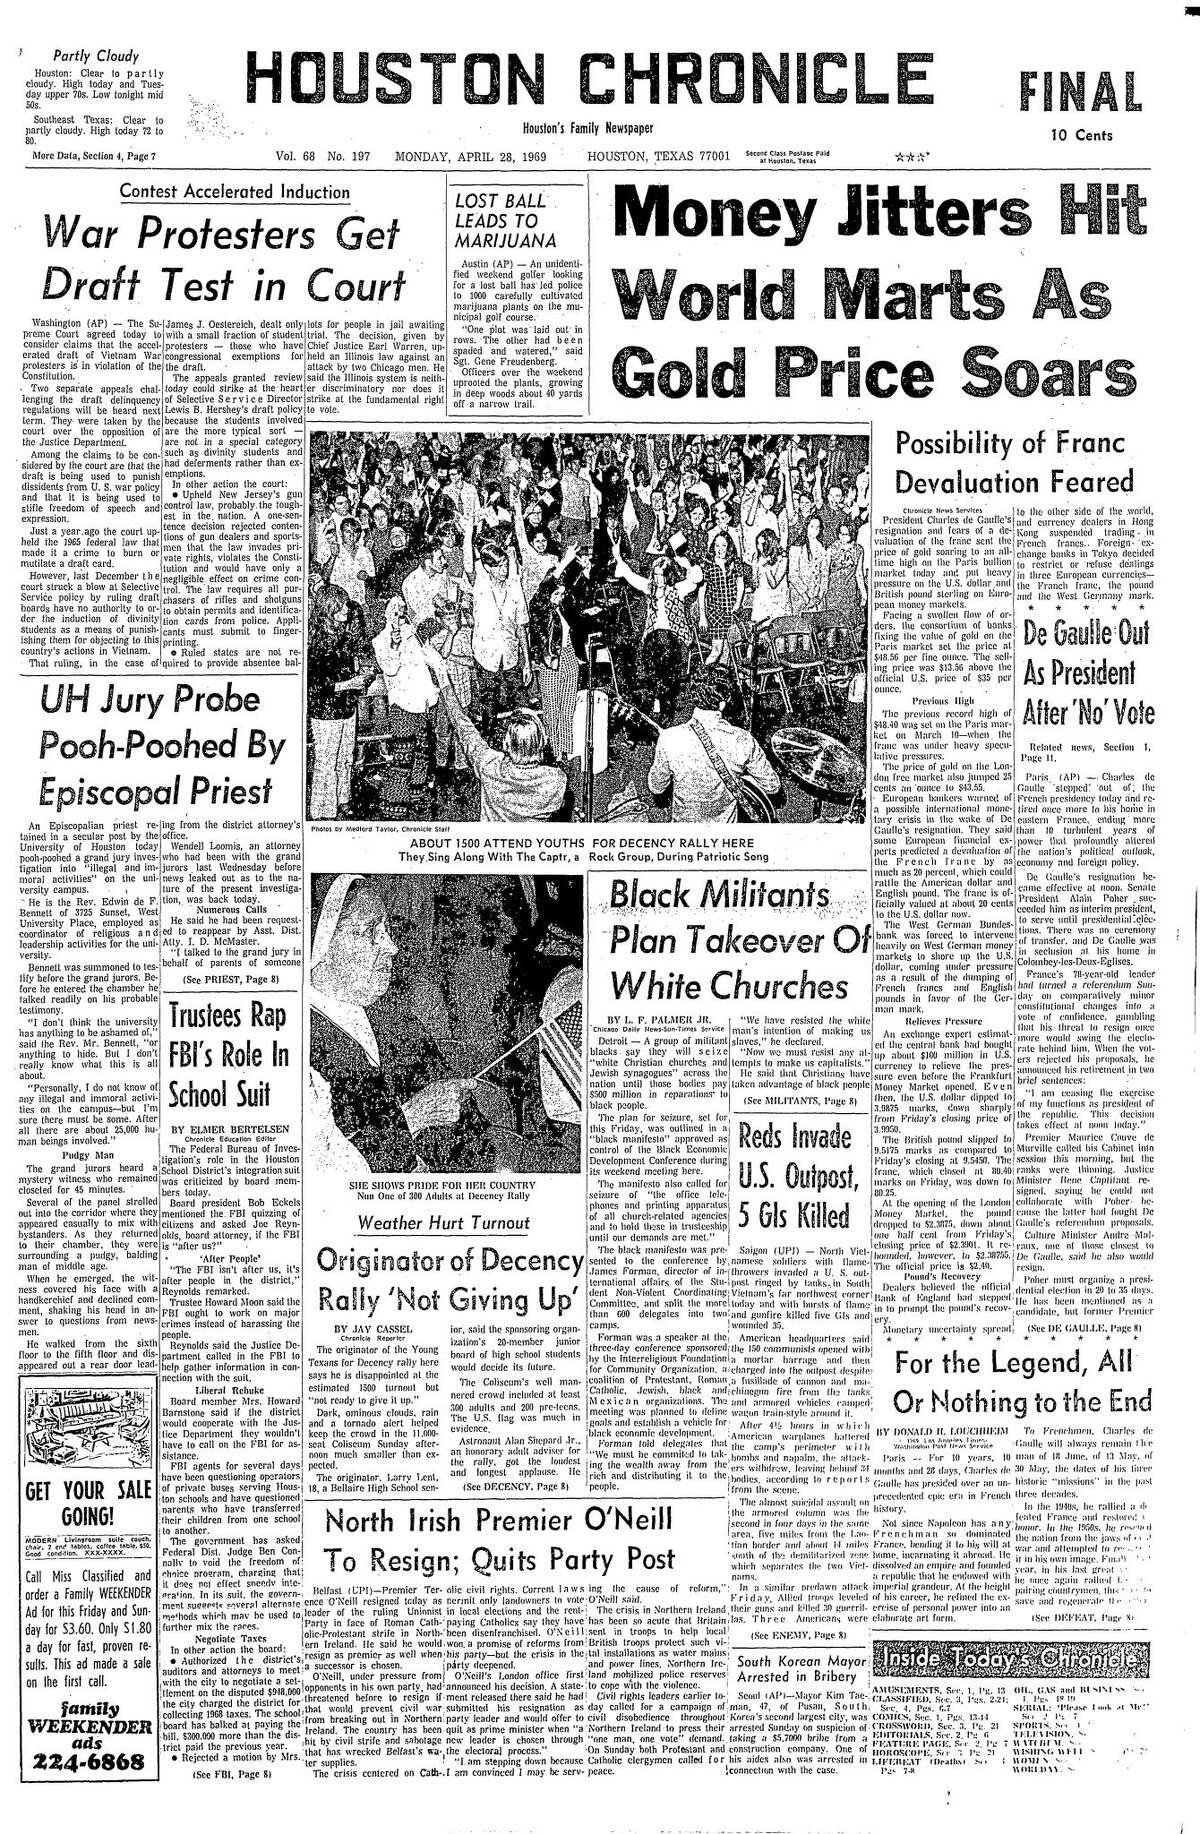 April 28, 1969